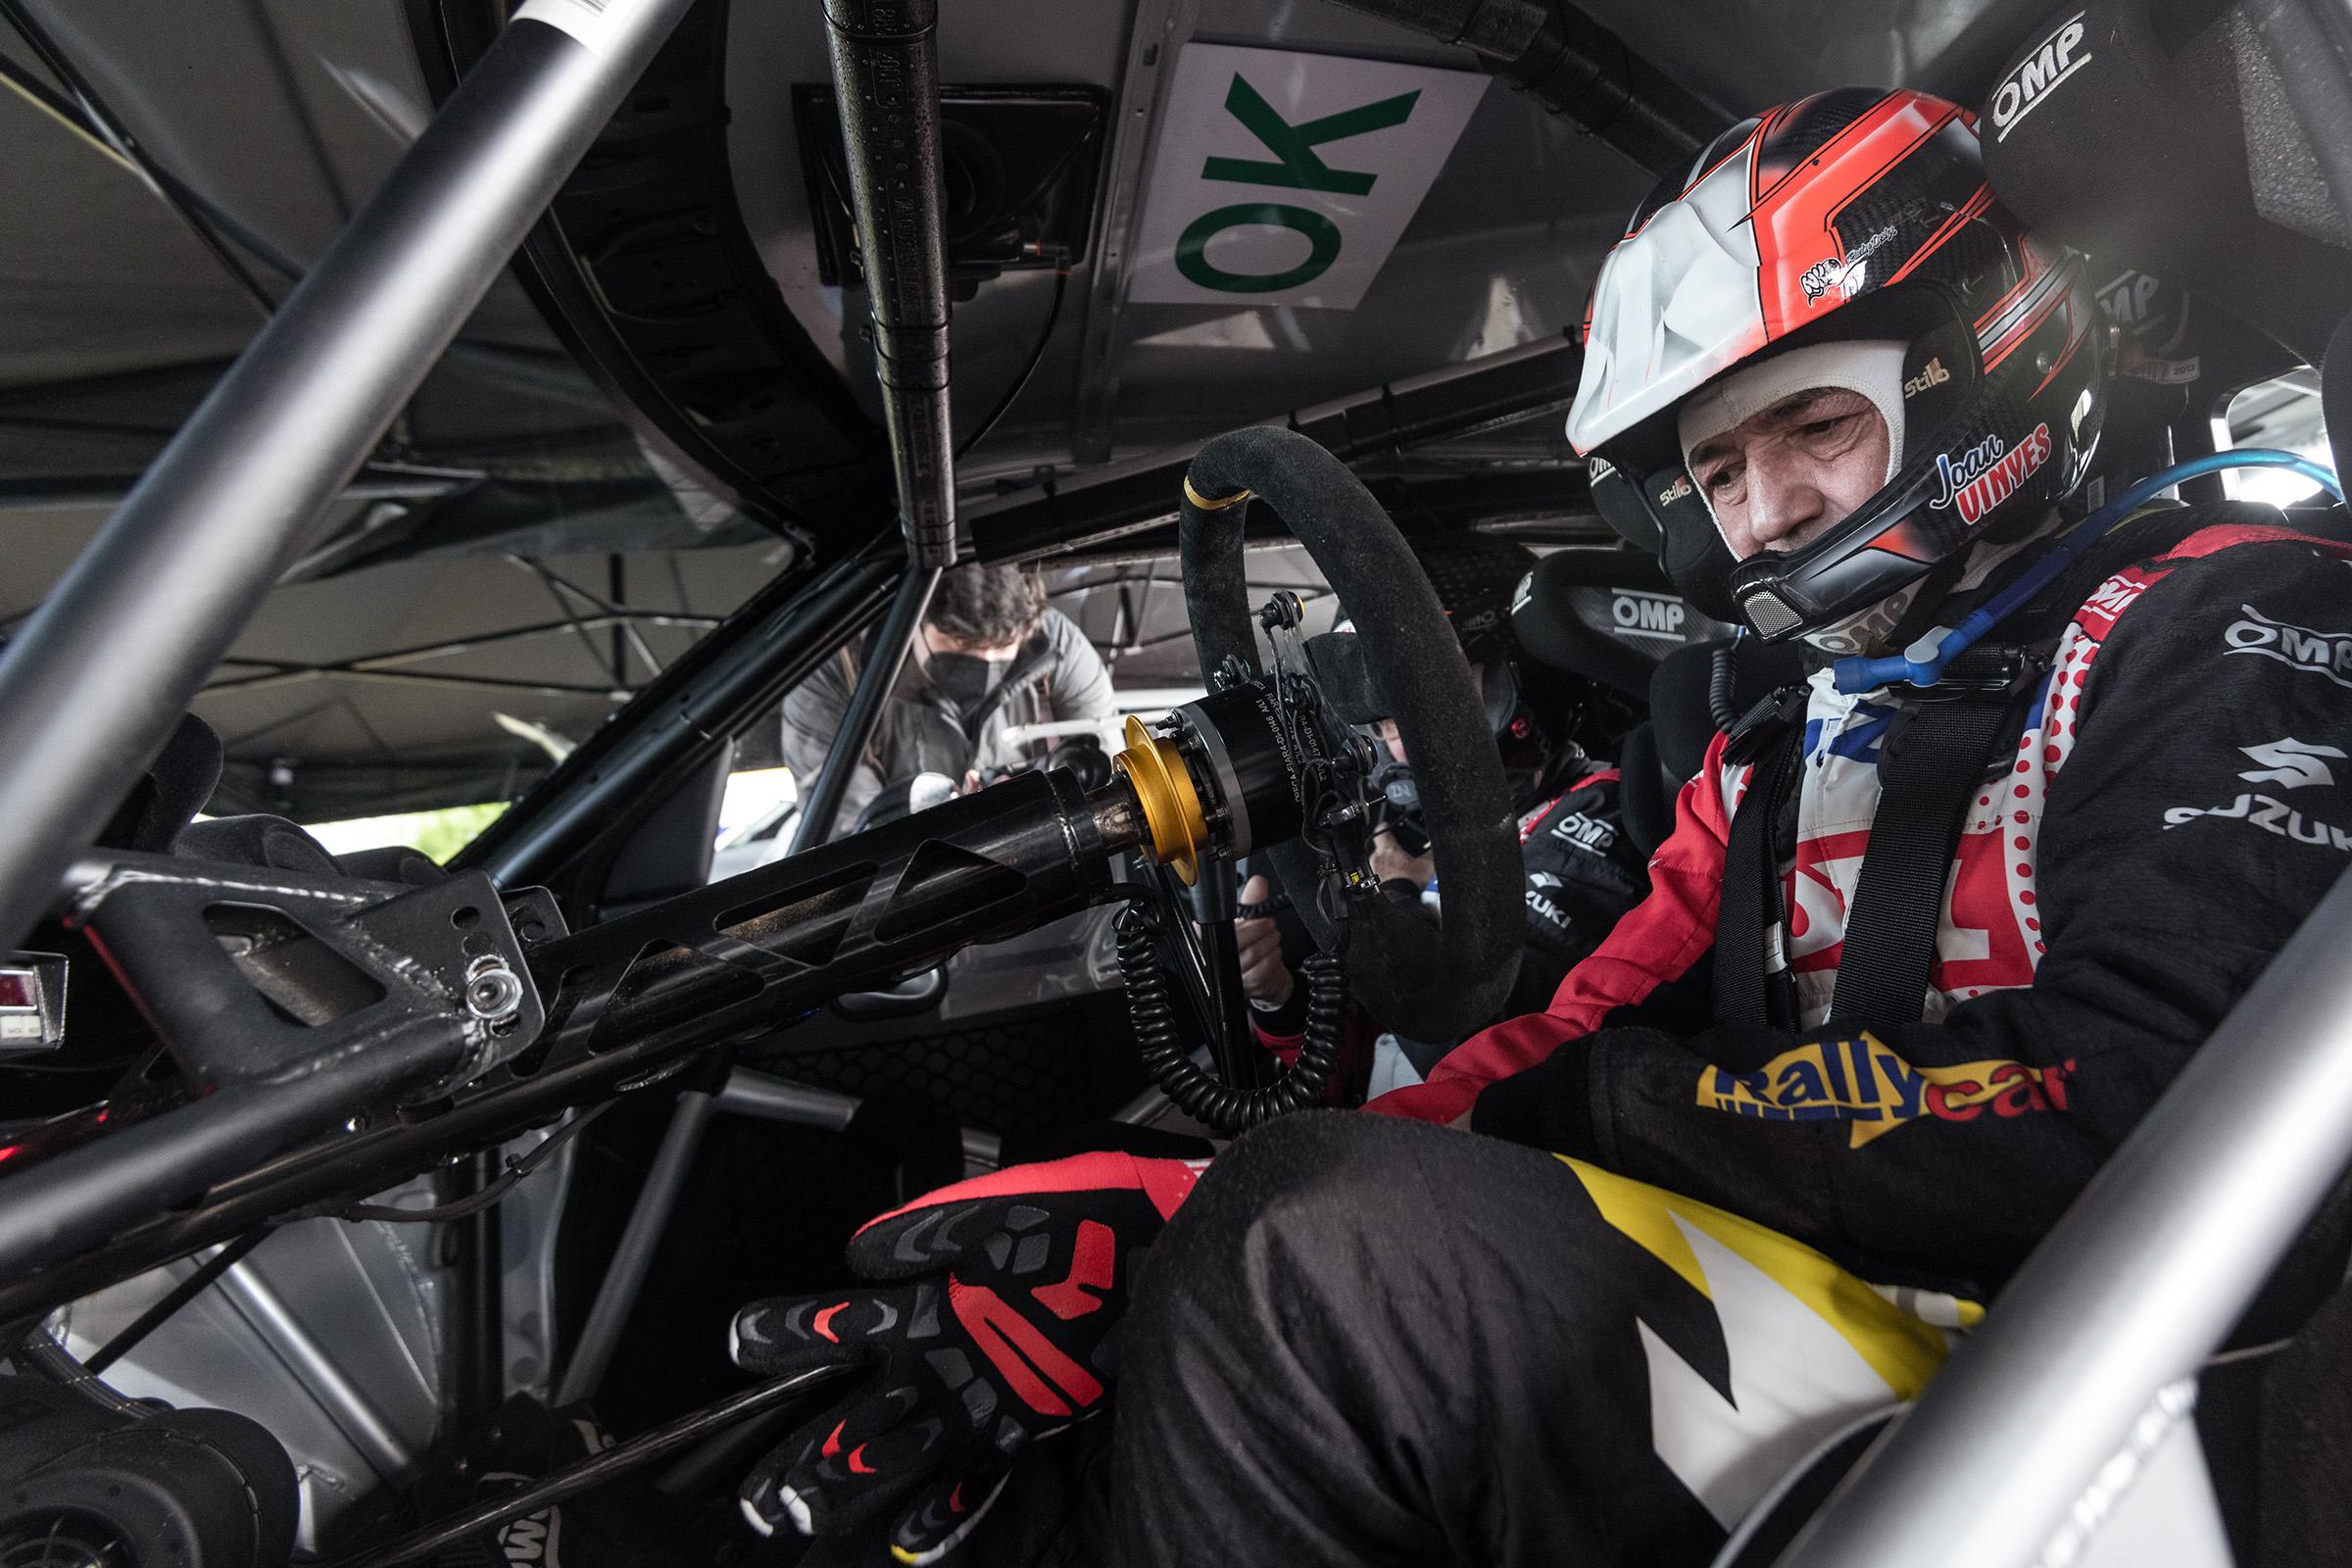 Vinyes - Mercader (Suzuki Swift R4lly S) començaran a competir a Còrdova.